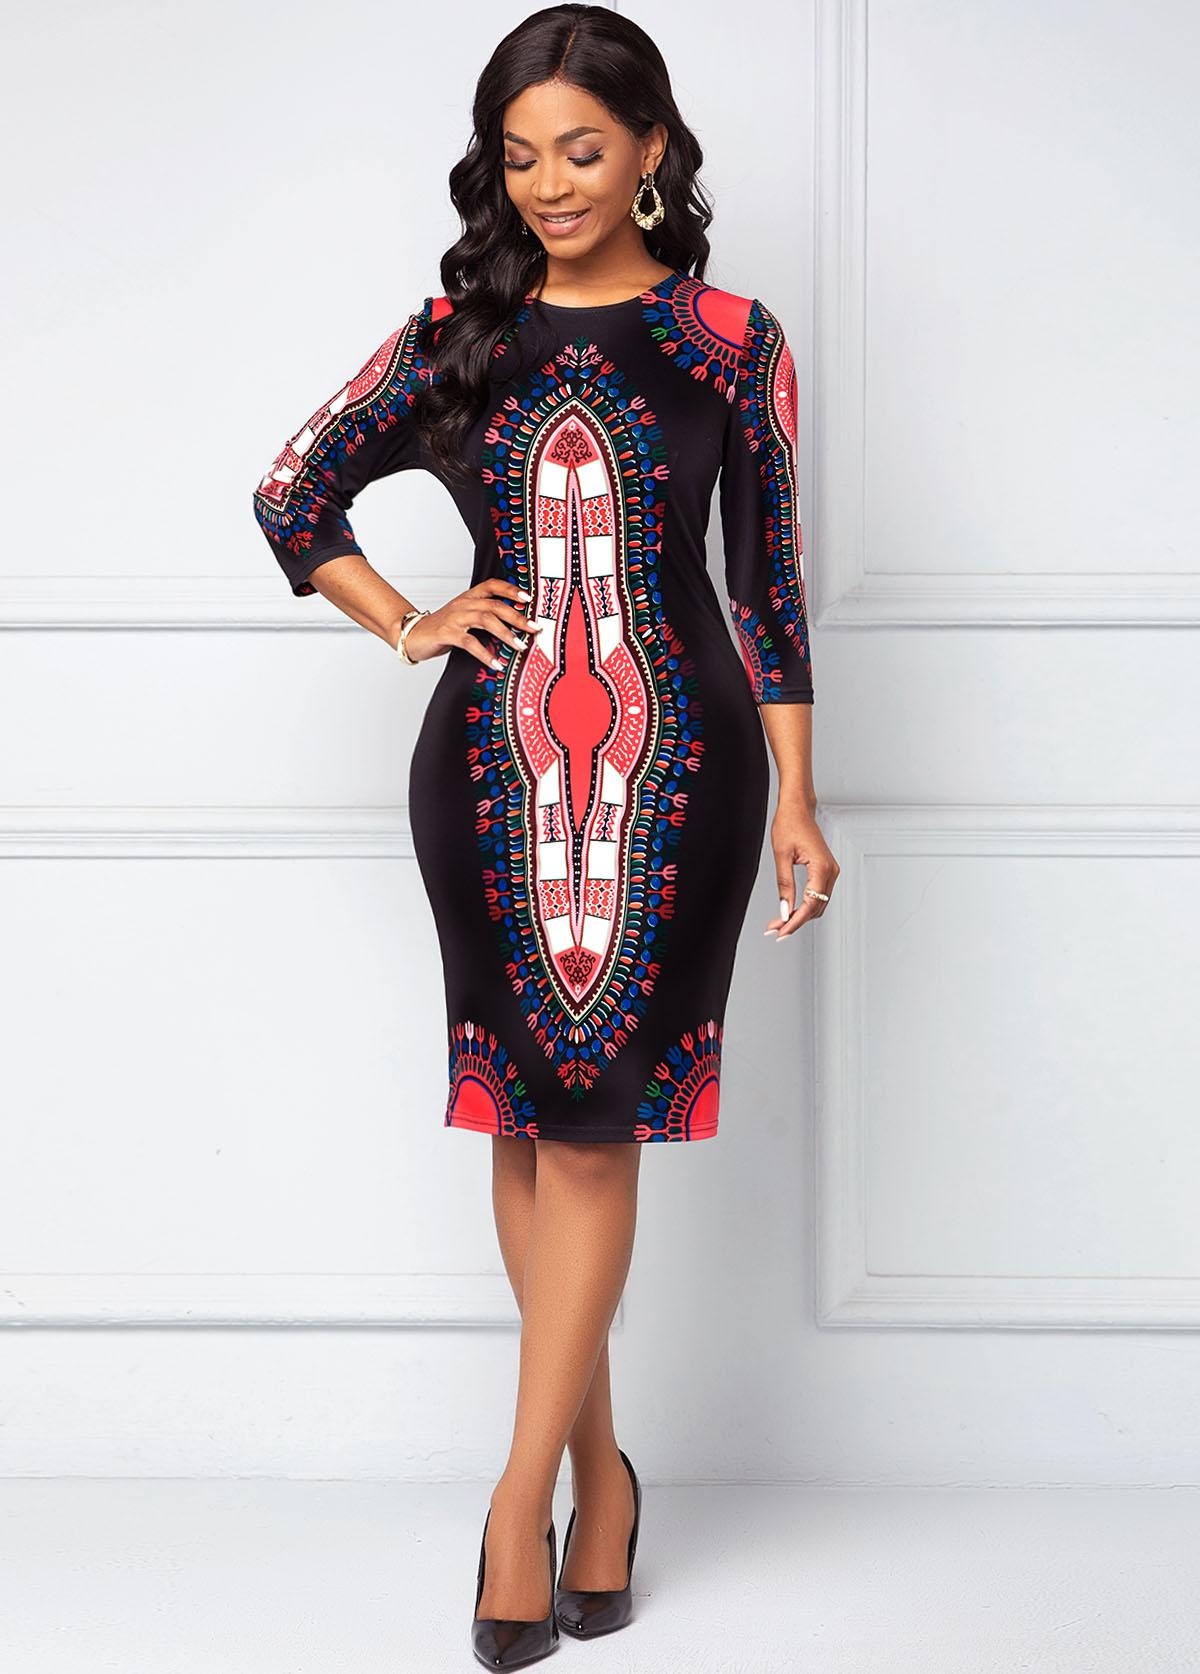 ROTITA Round Neck 3/4 Sleeve Dashiki Print Dress